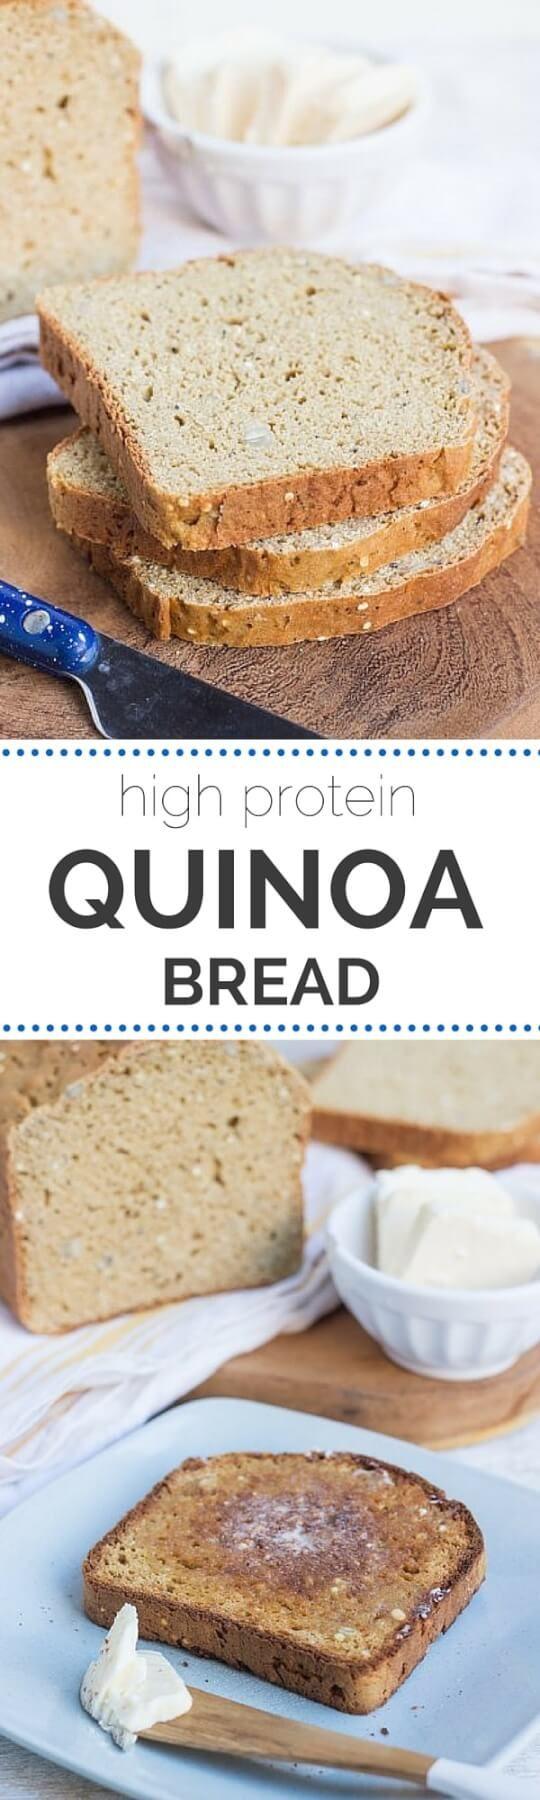 9 Of The Best Ever Gluten Free Quinoa Flour Recipes My Natural Family Recipe Quinoa Bread Quinoa Flour Recipes Food